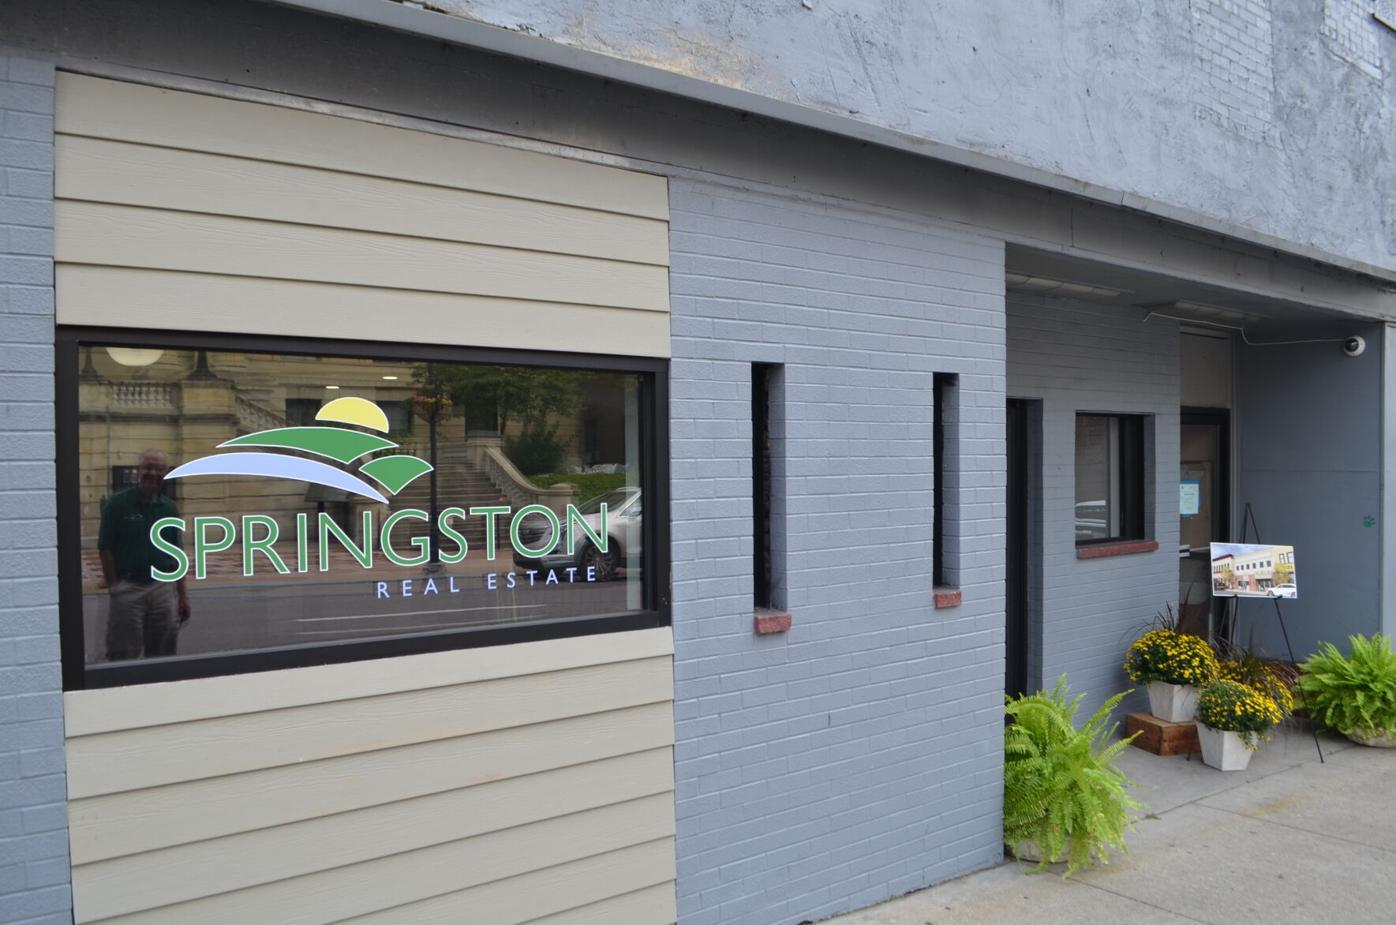 Springston exterior